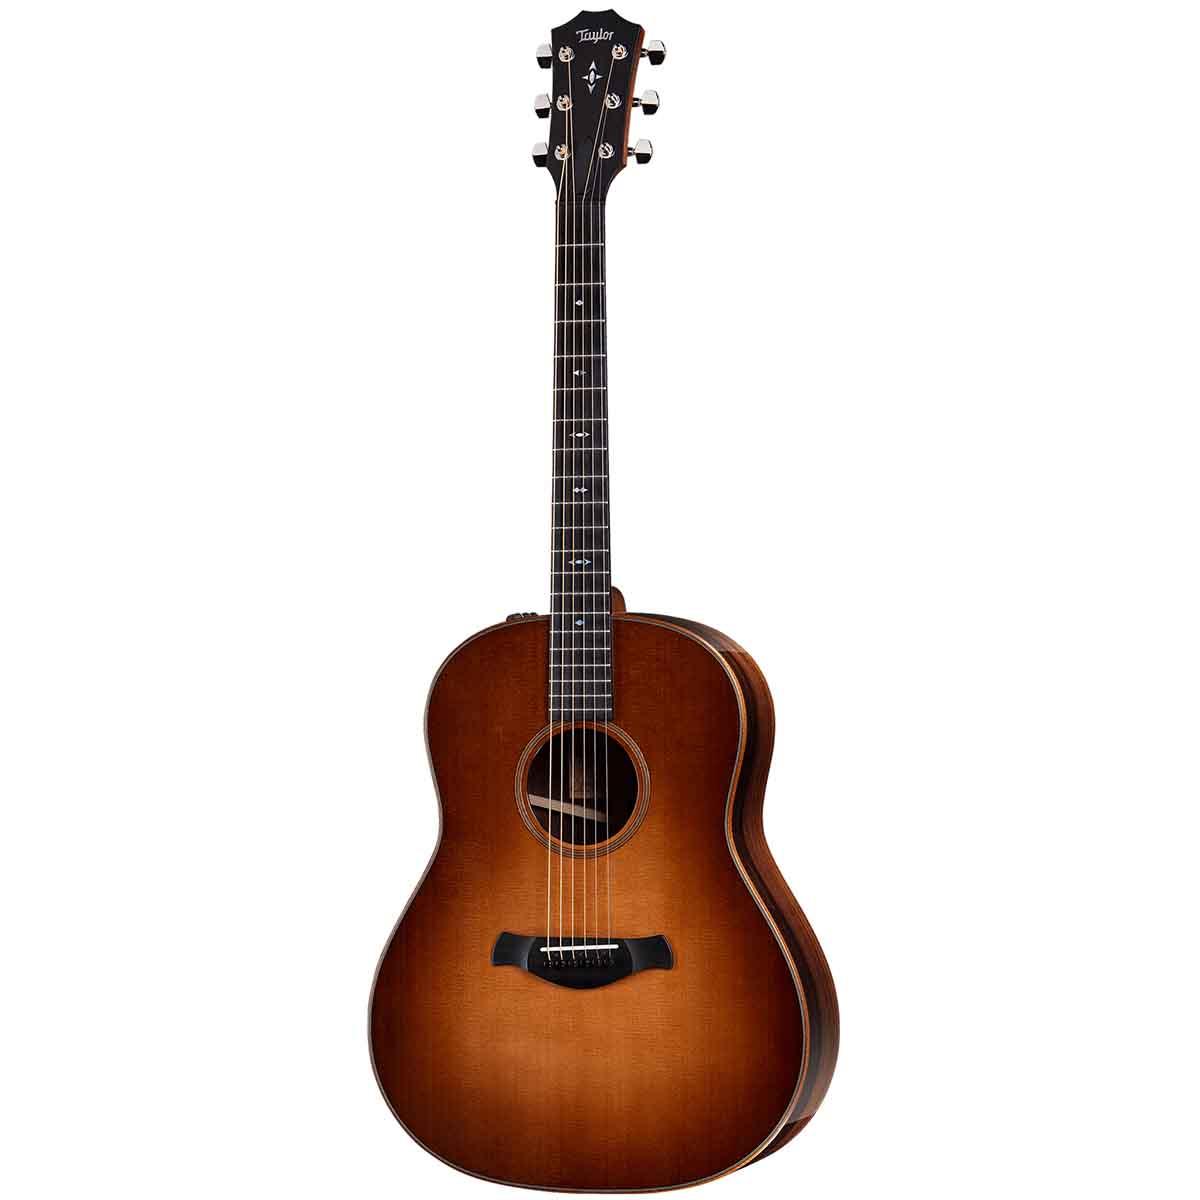 Taylor Builders Edition 717e WHB western-guitar wild honey burst